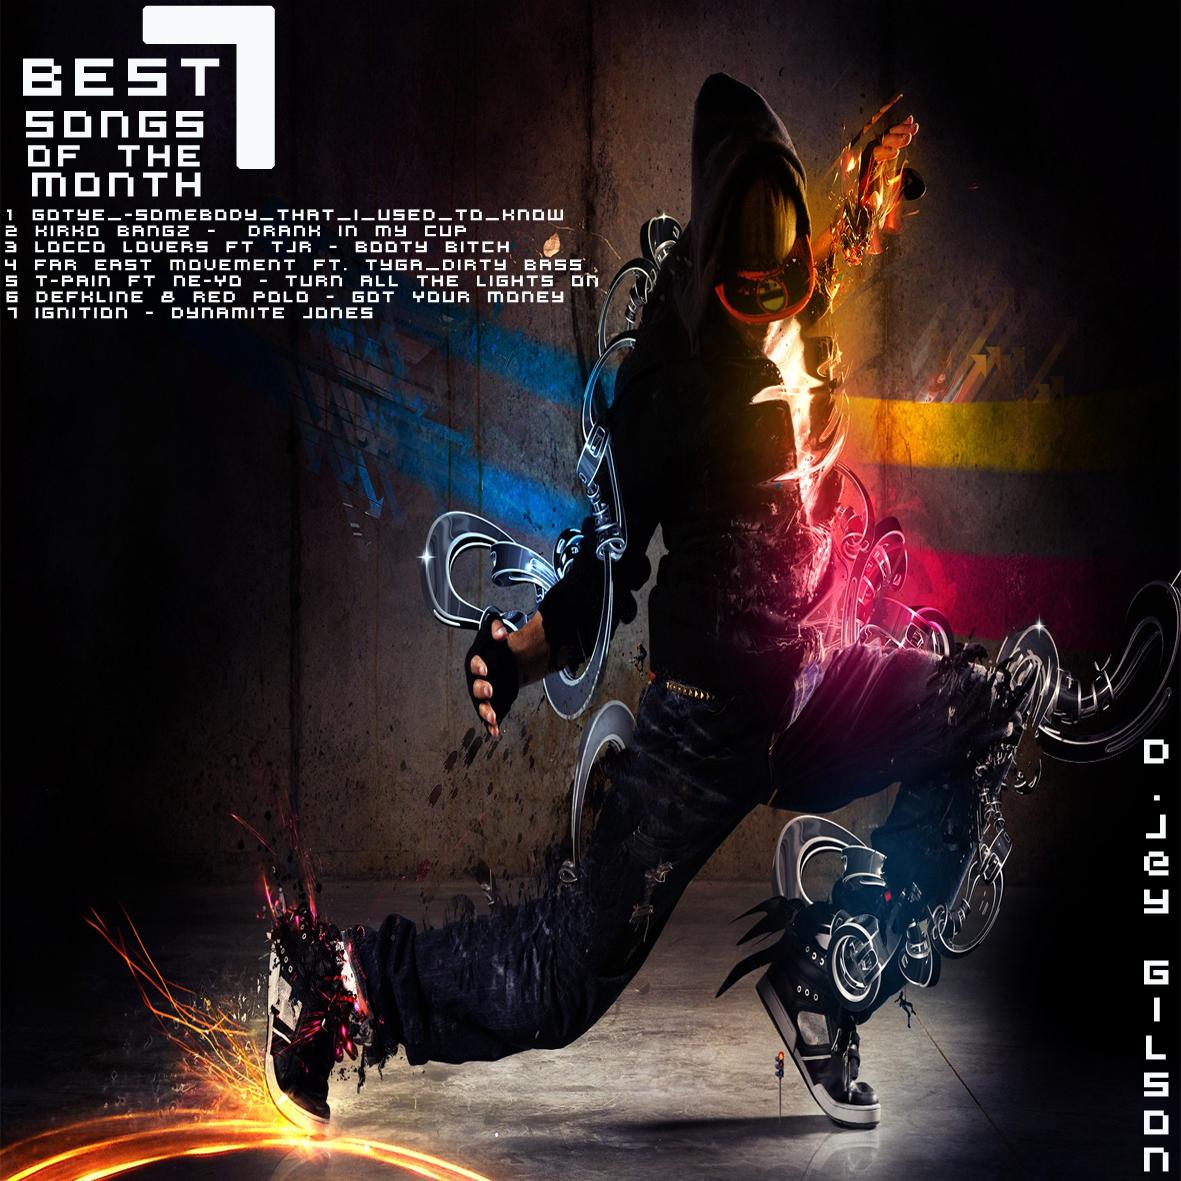 http://3.bp.blogspot.com/-iSirGXZqAGg/UBp6SGKqdzI/AAAAAAAAApI/PoCvJLN4DIM/s1600/7+BEST+SONGS+JULY+2012.jpg